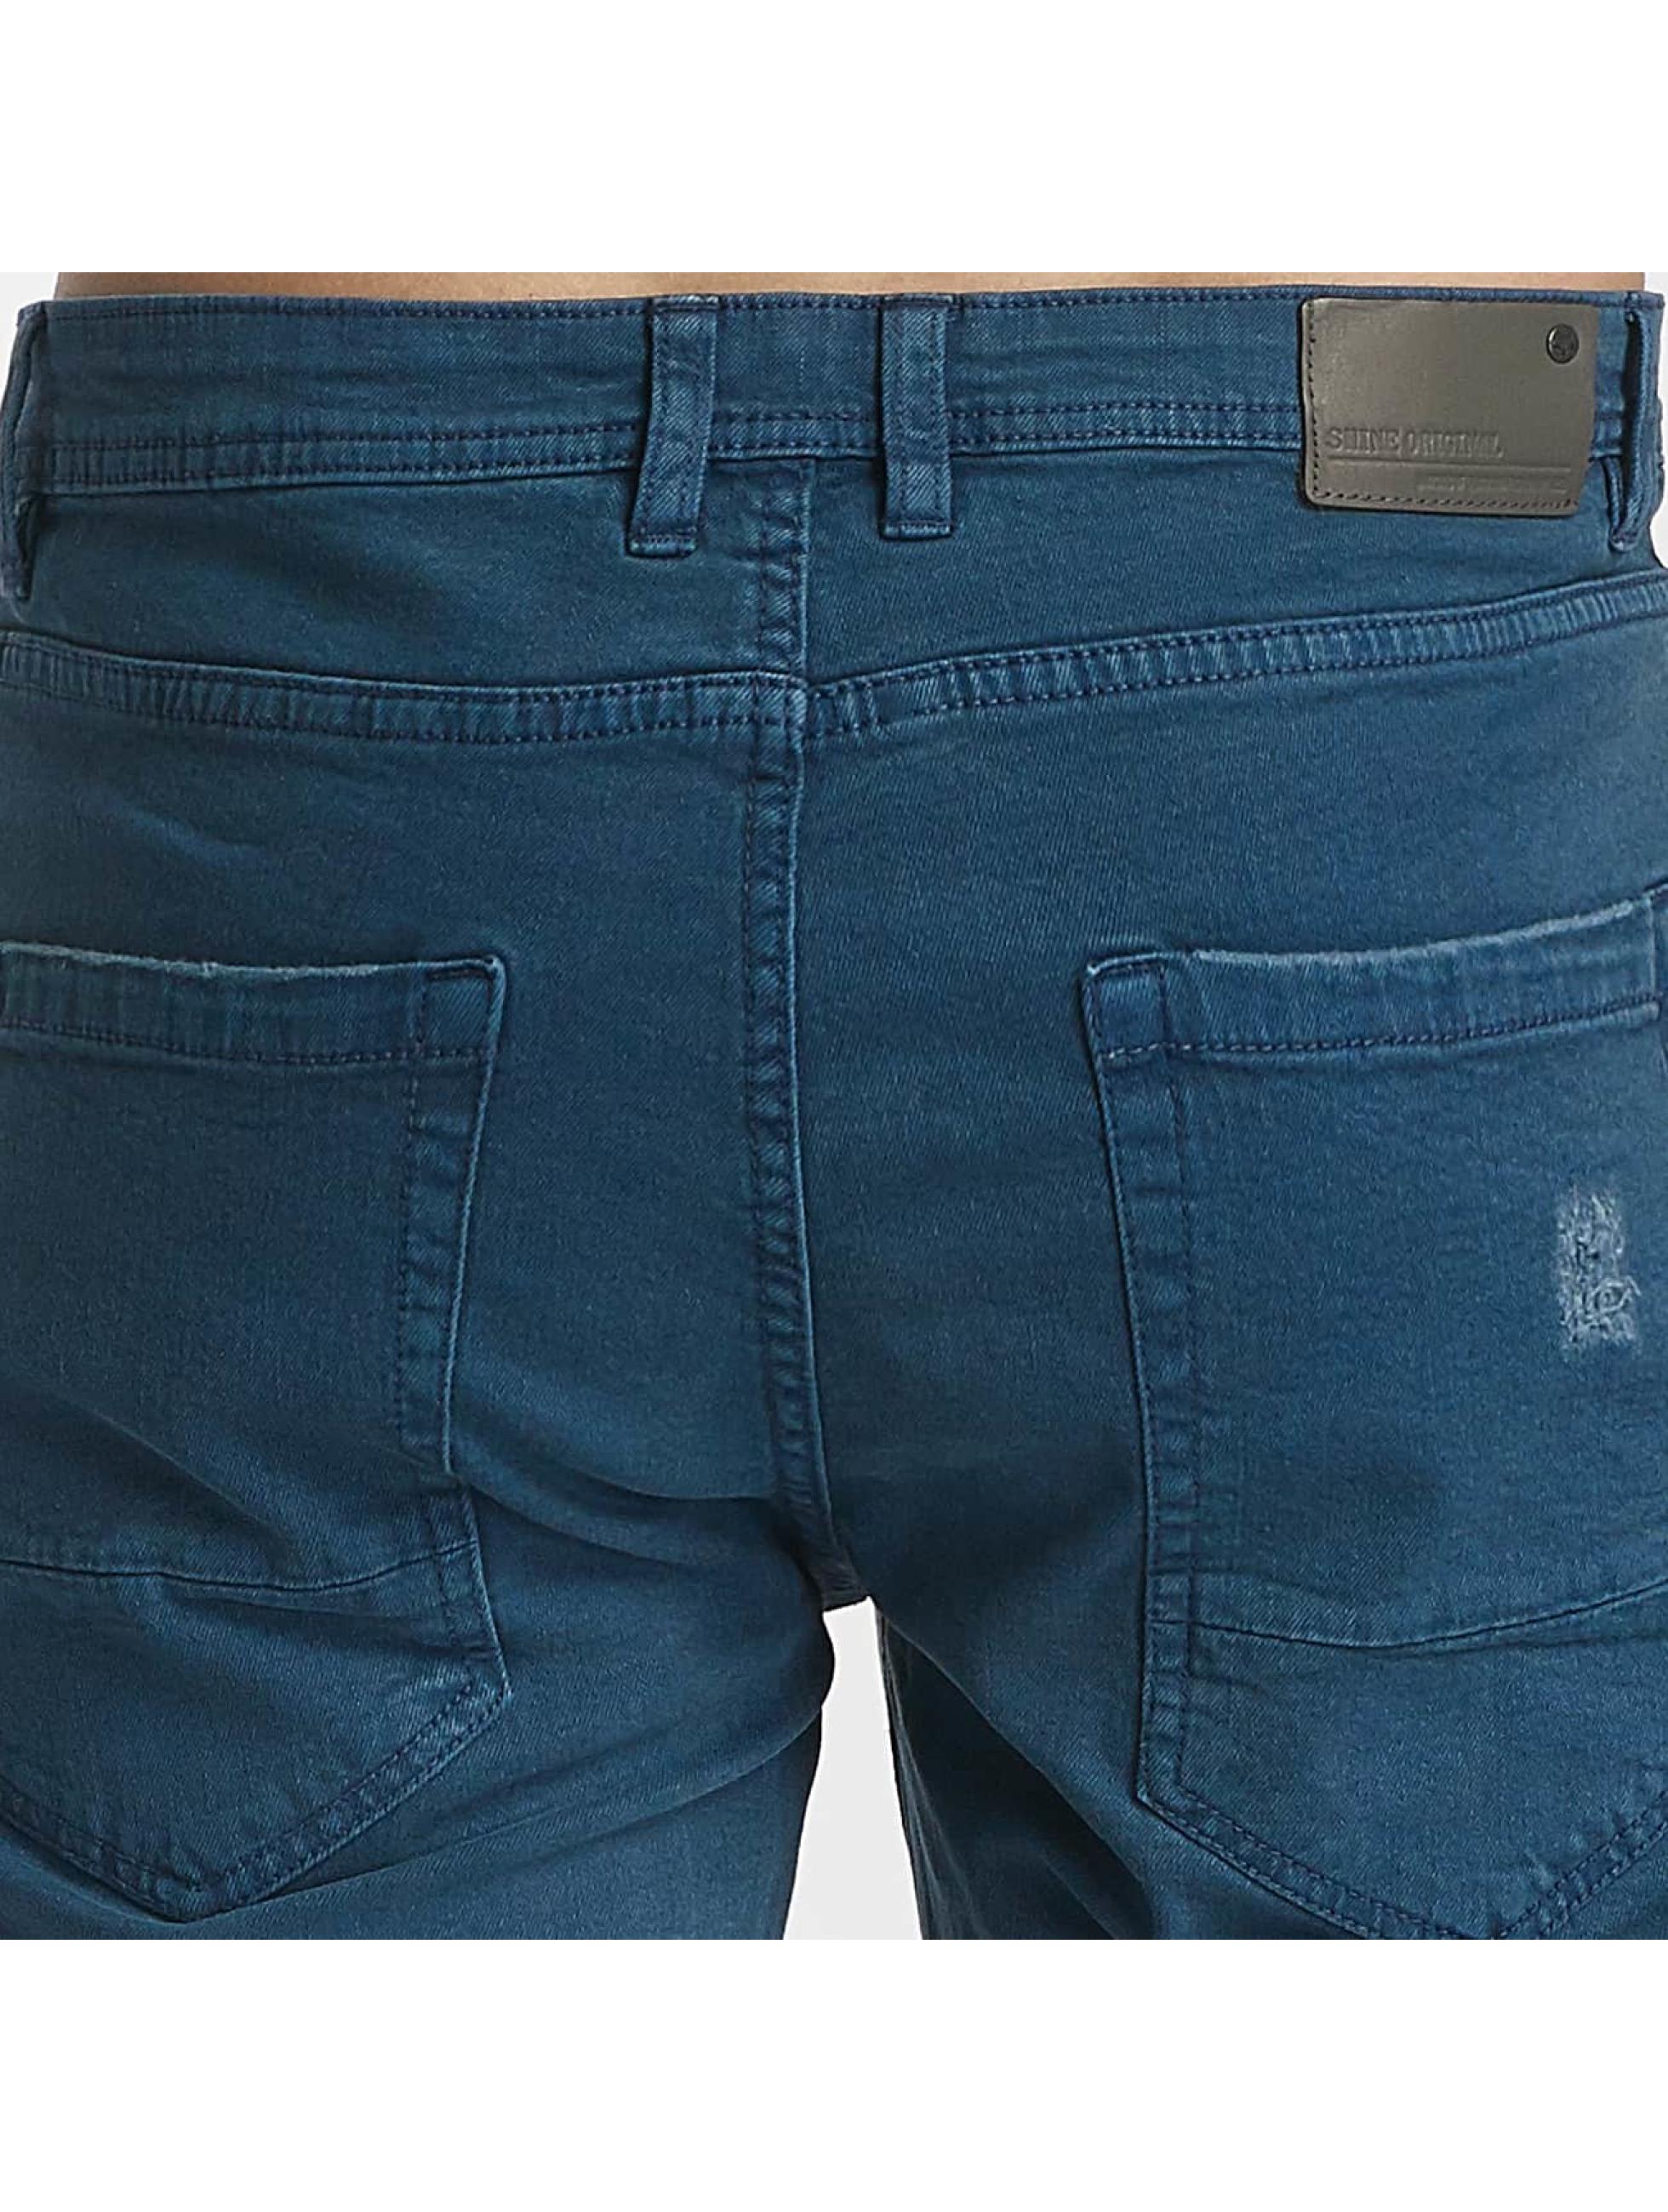 SHINE Original Straight Fit Jeans Wyatt blue